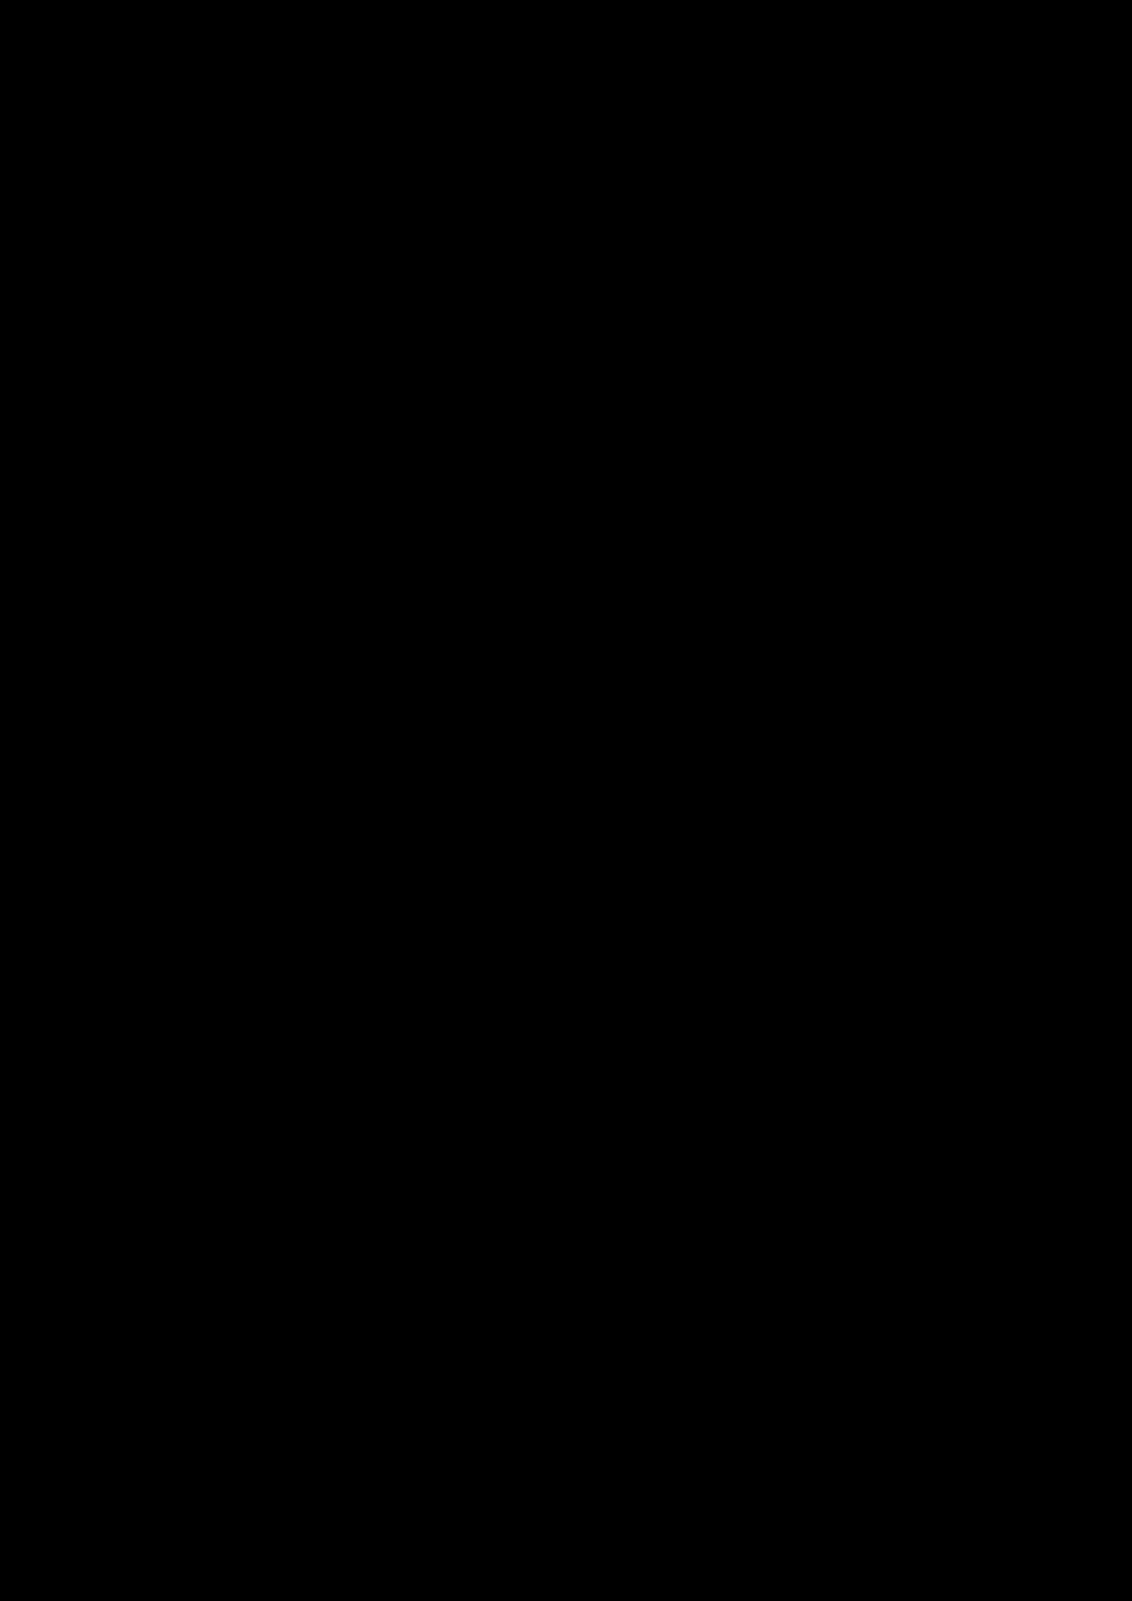 Ten lyubvi slide, Image 25